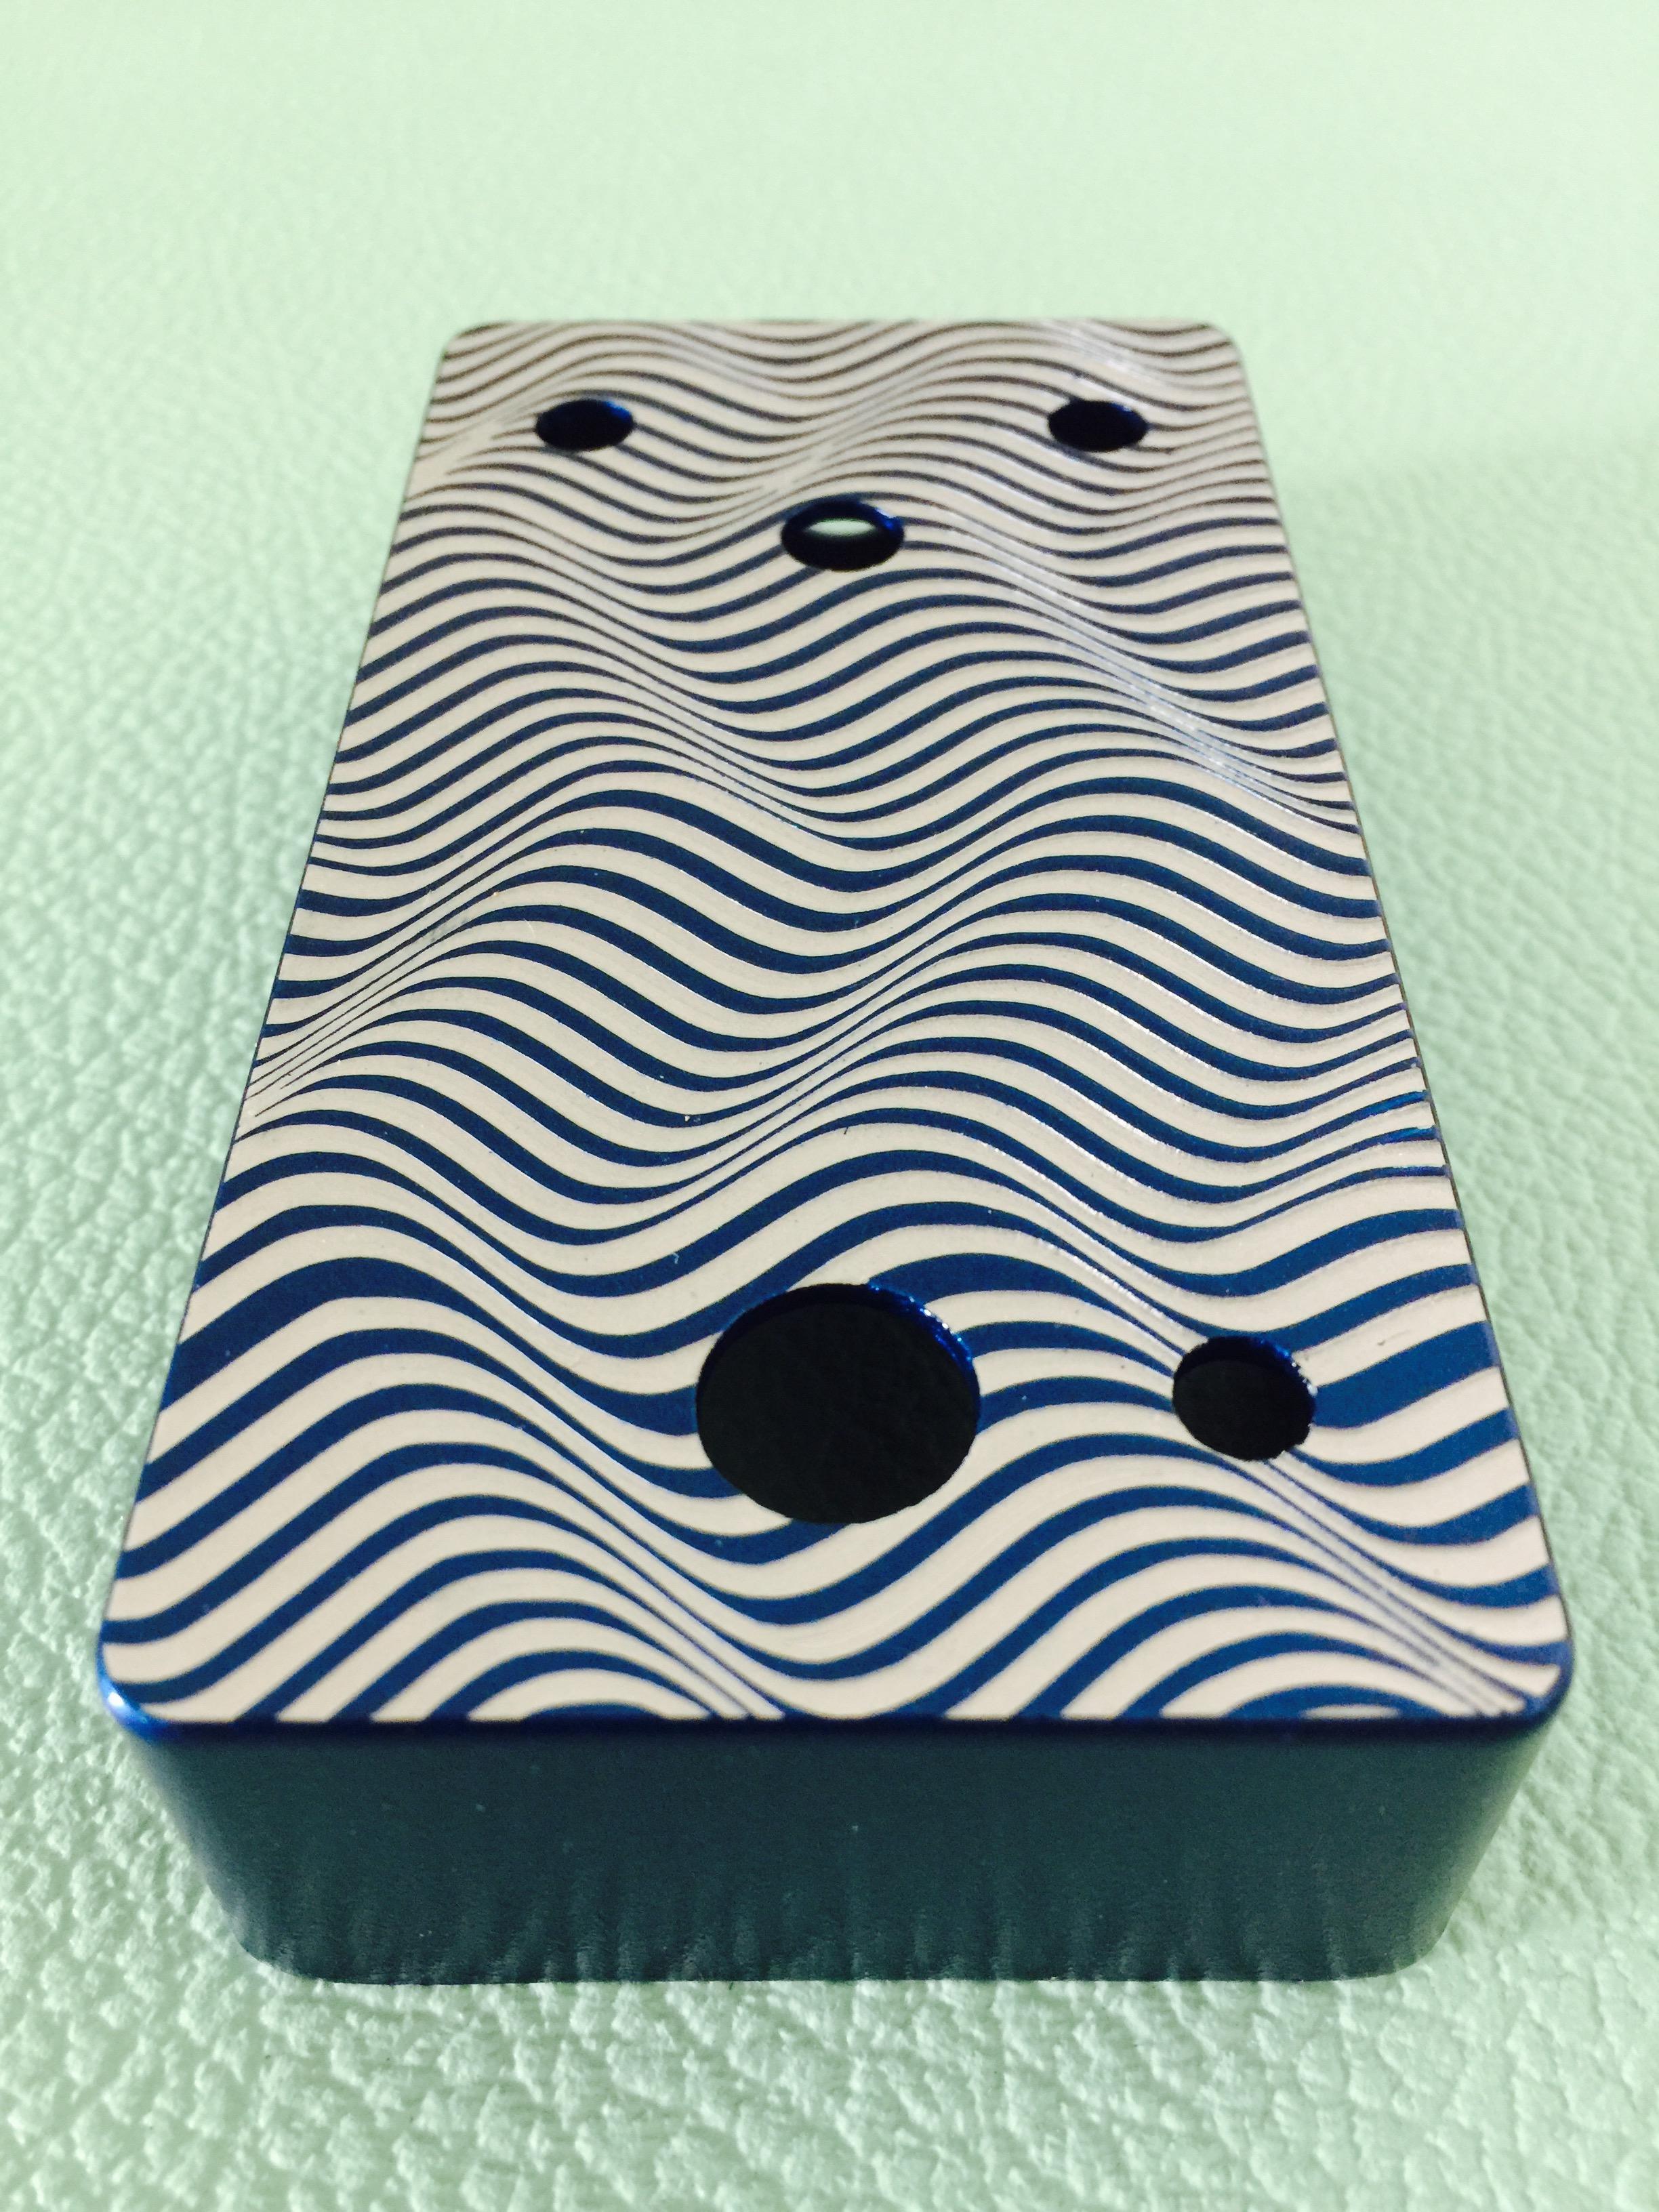 Custom wave illusion design by Eddie Serratos.